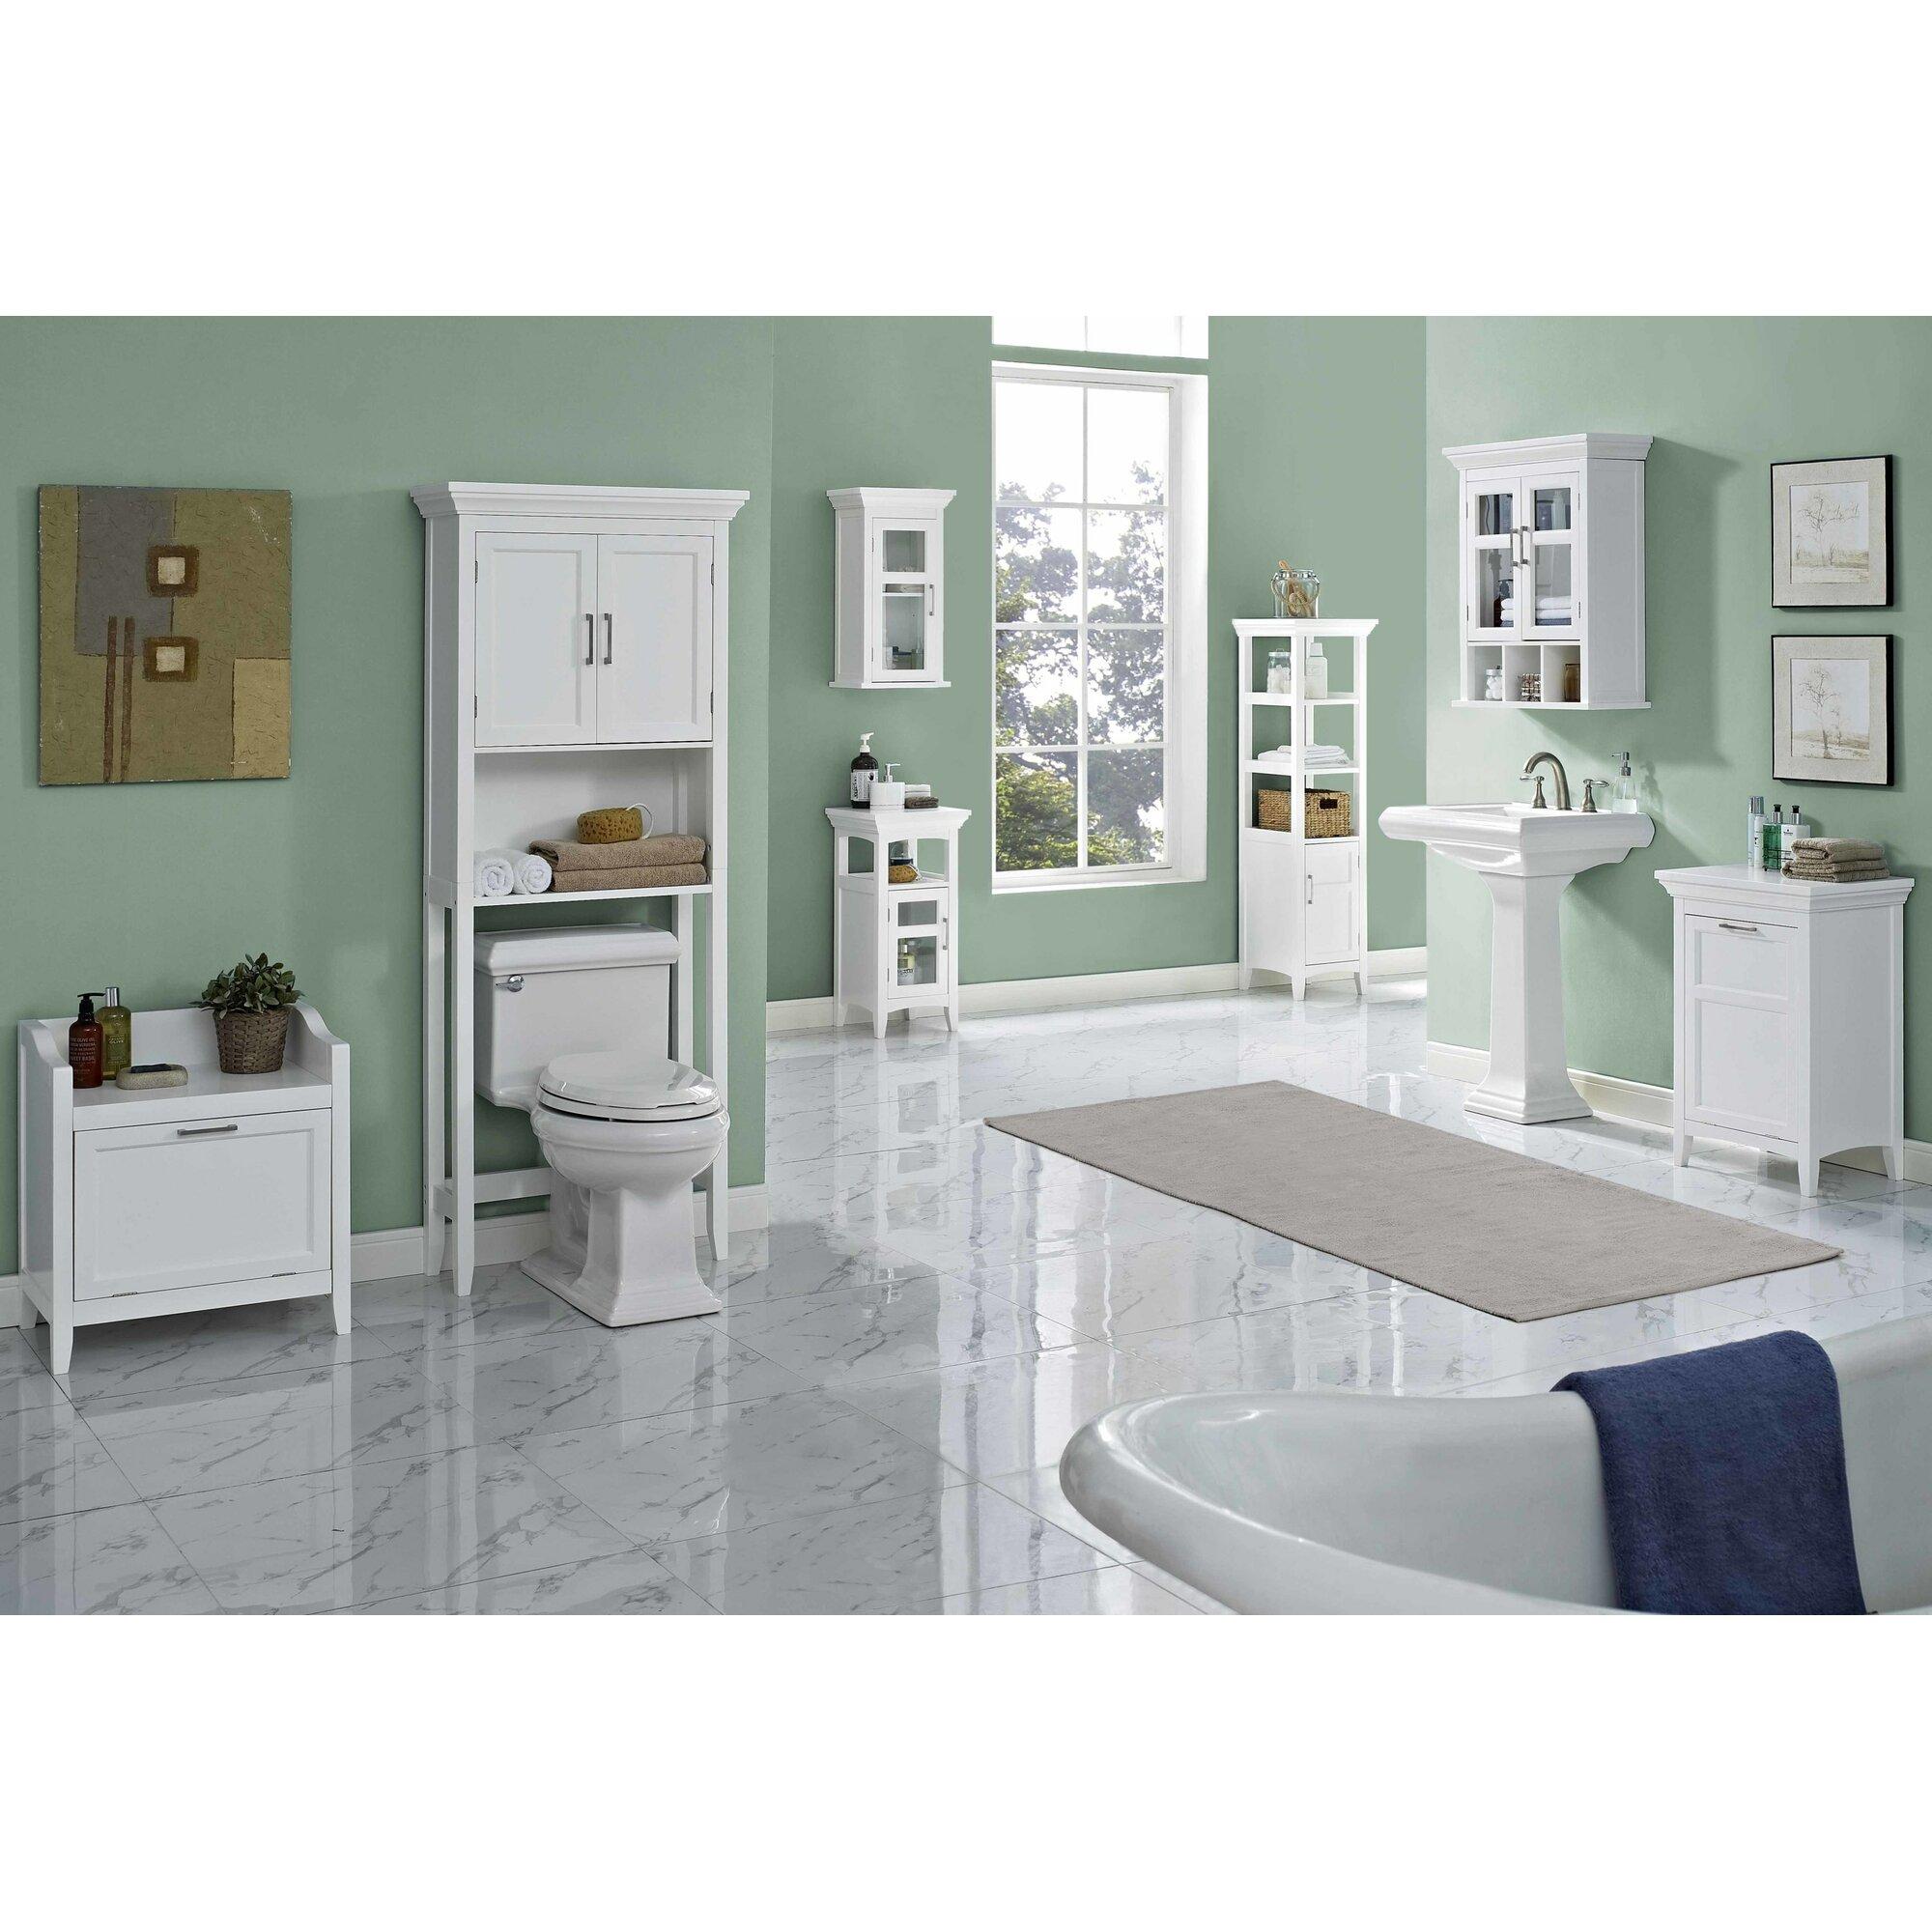 Avington Cabinet Laundry Hamper With Built In Laundry Hamper